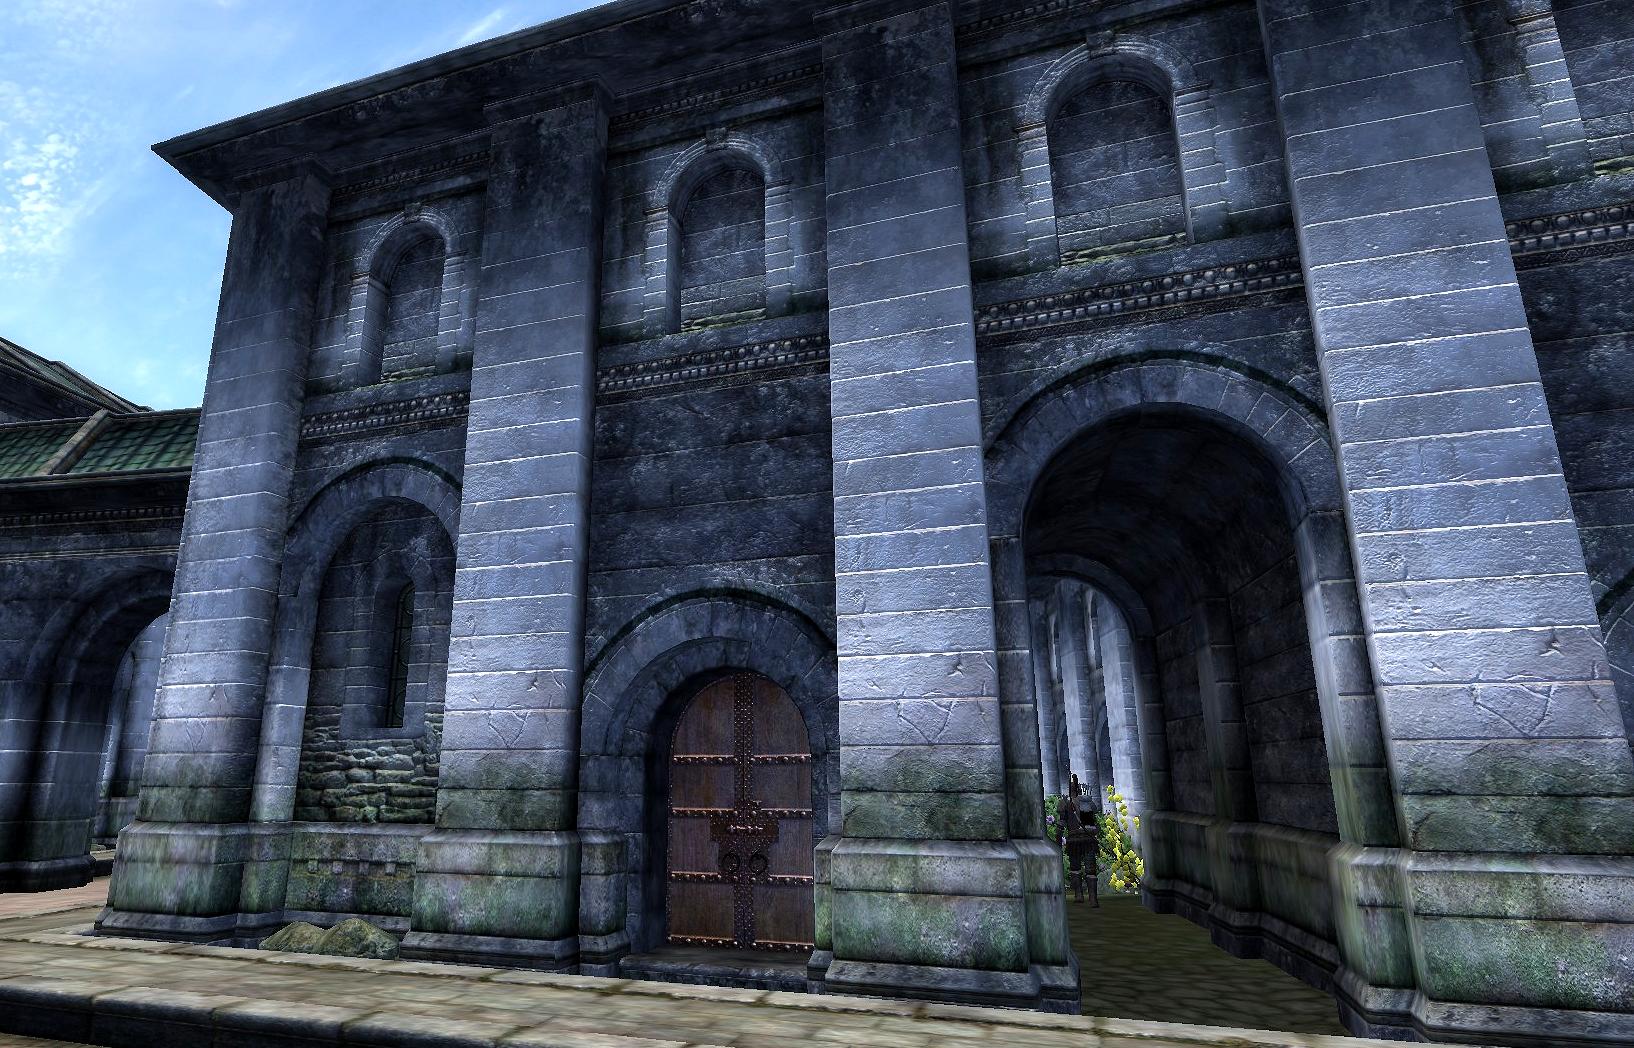 Marinus Catiotus' House